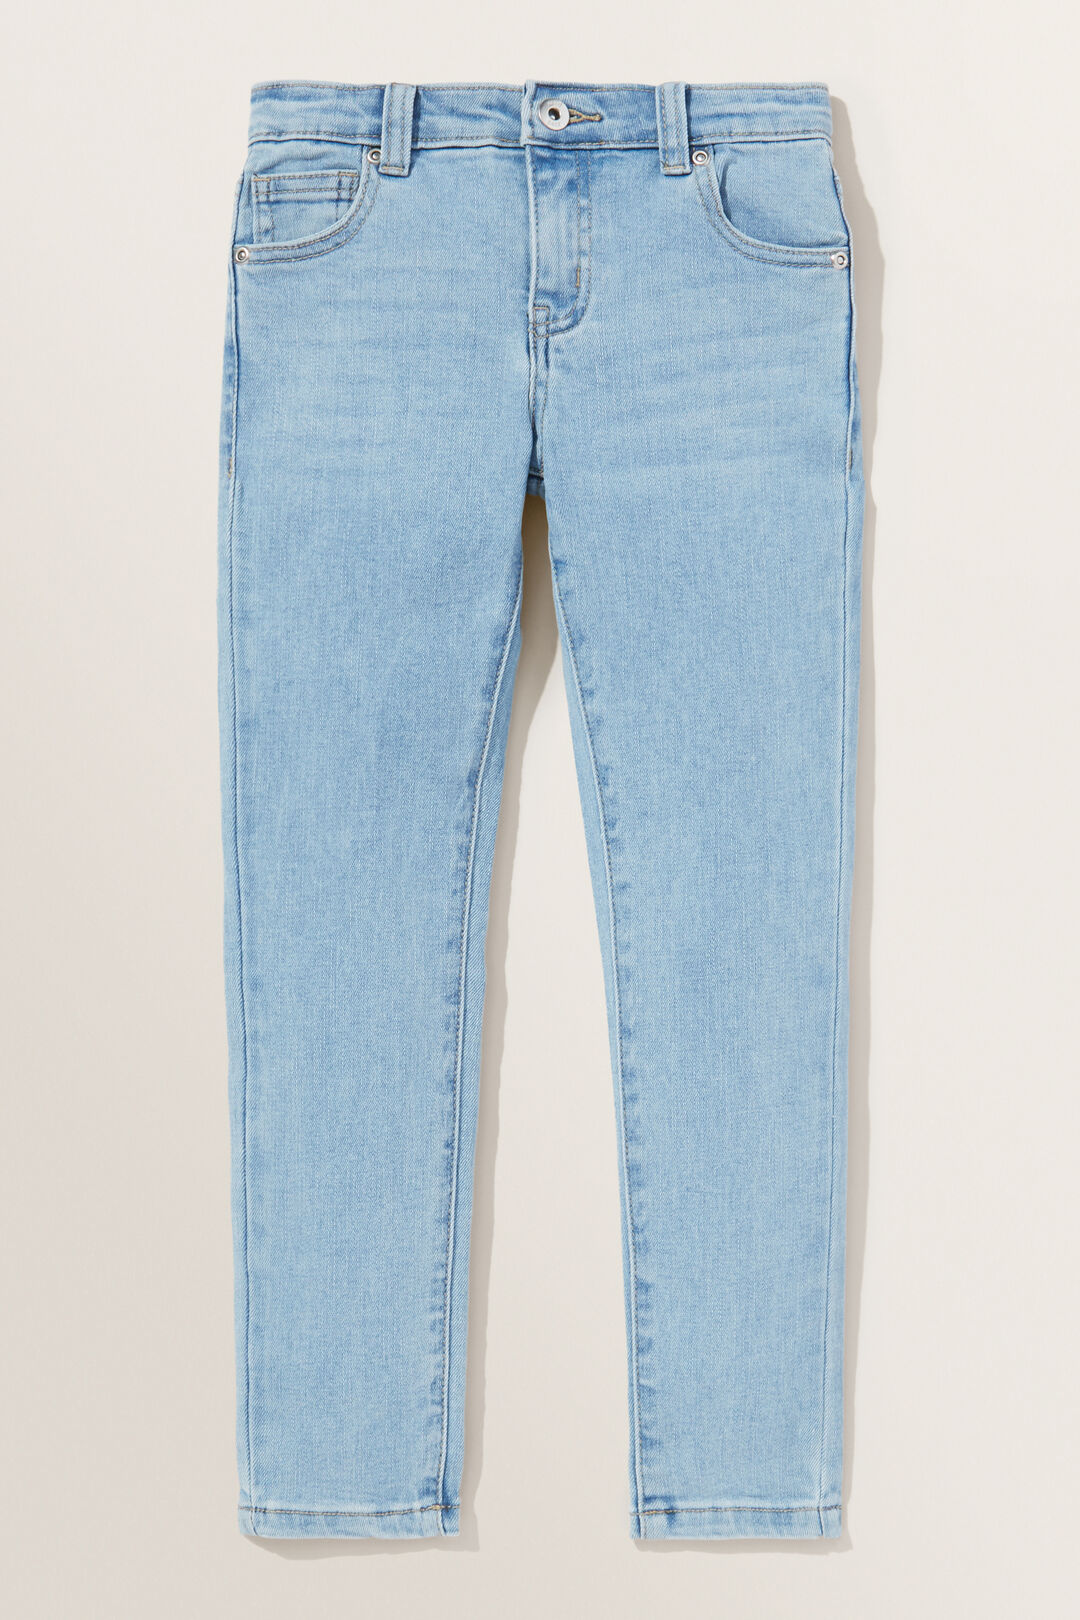 Classic Jeans  BLEACHED BLUE  hi-res